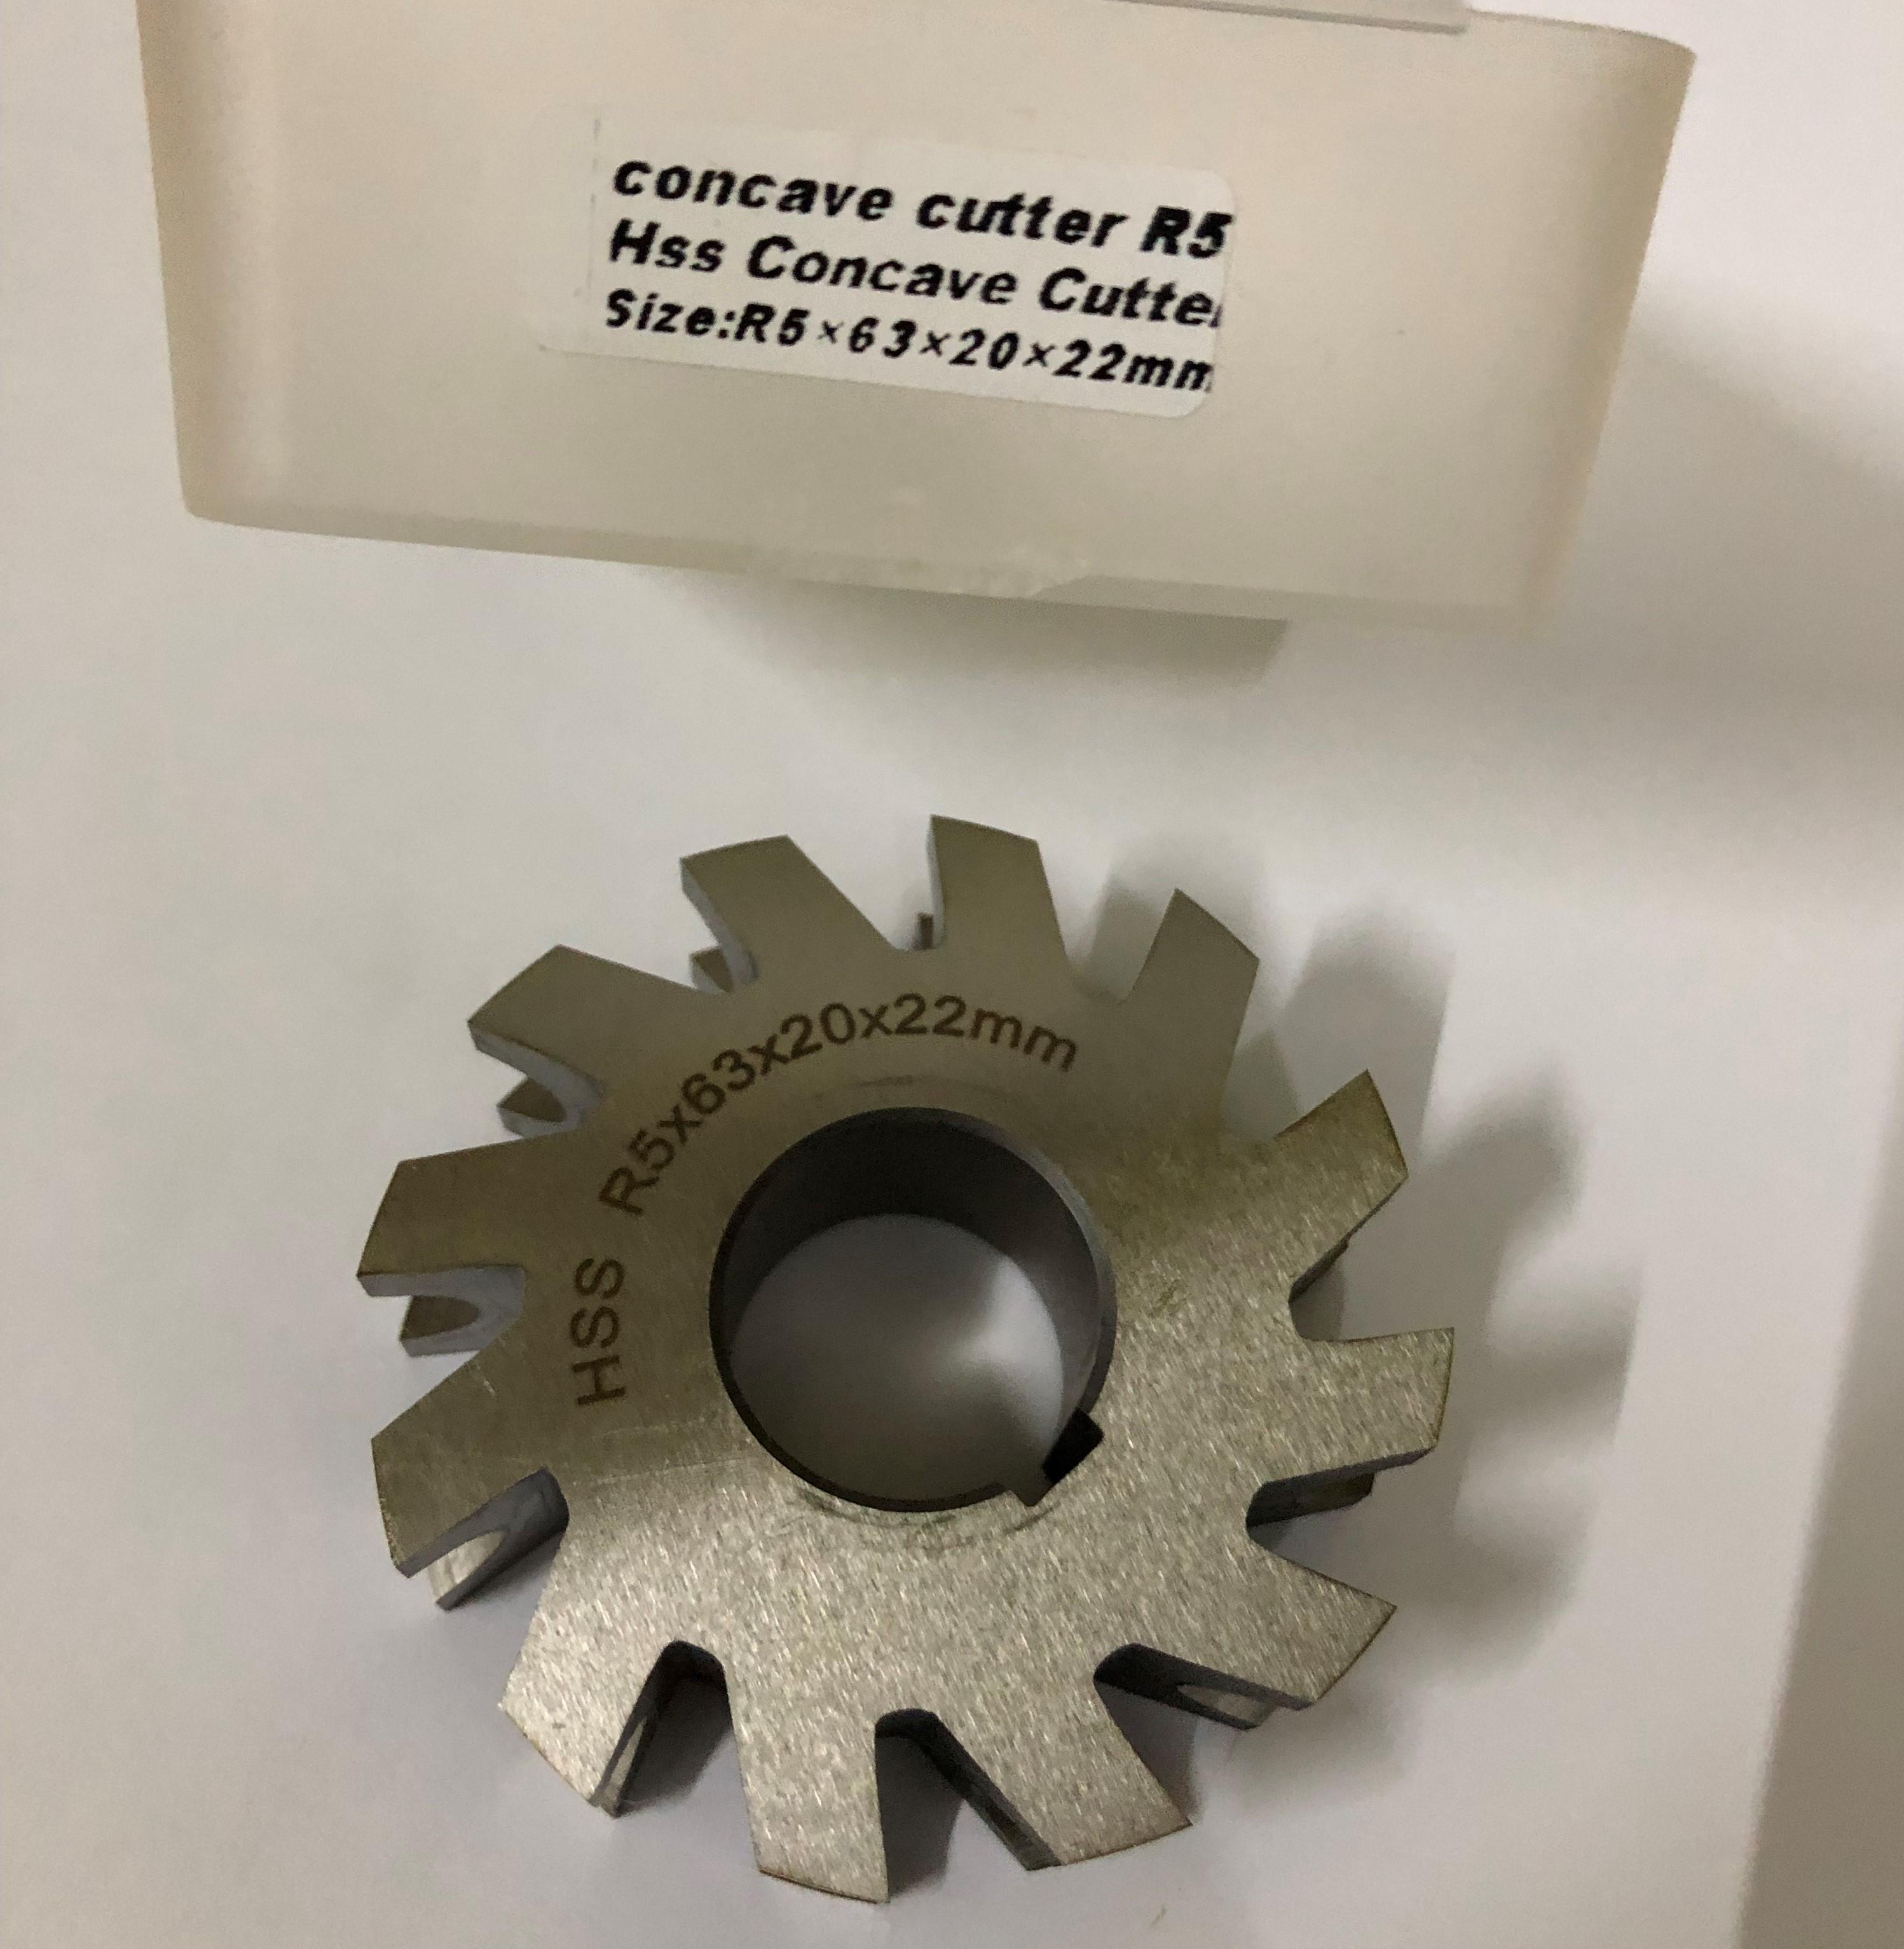 Concave Cutter R5